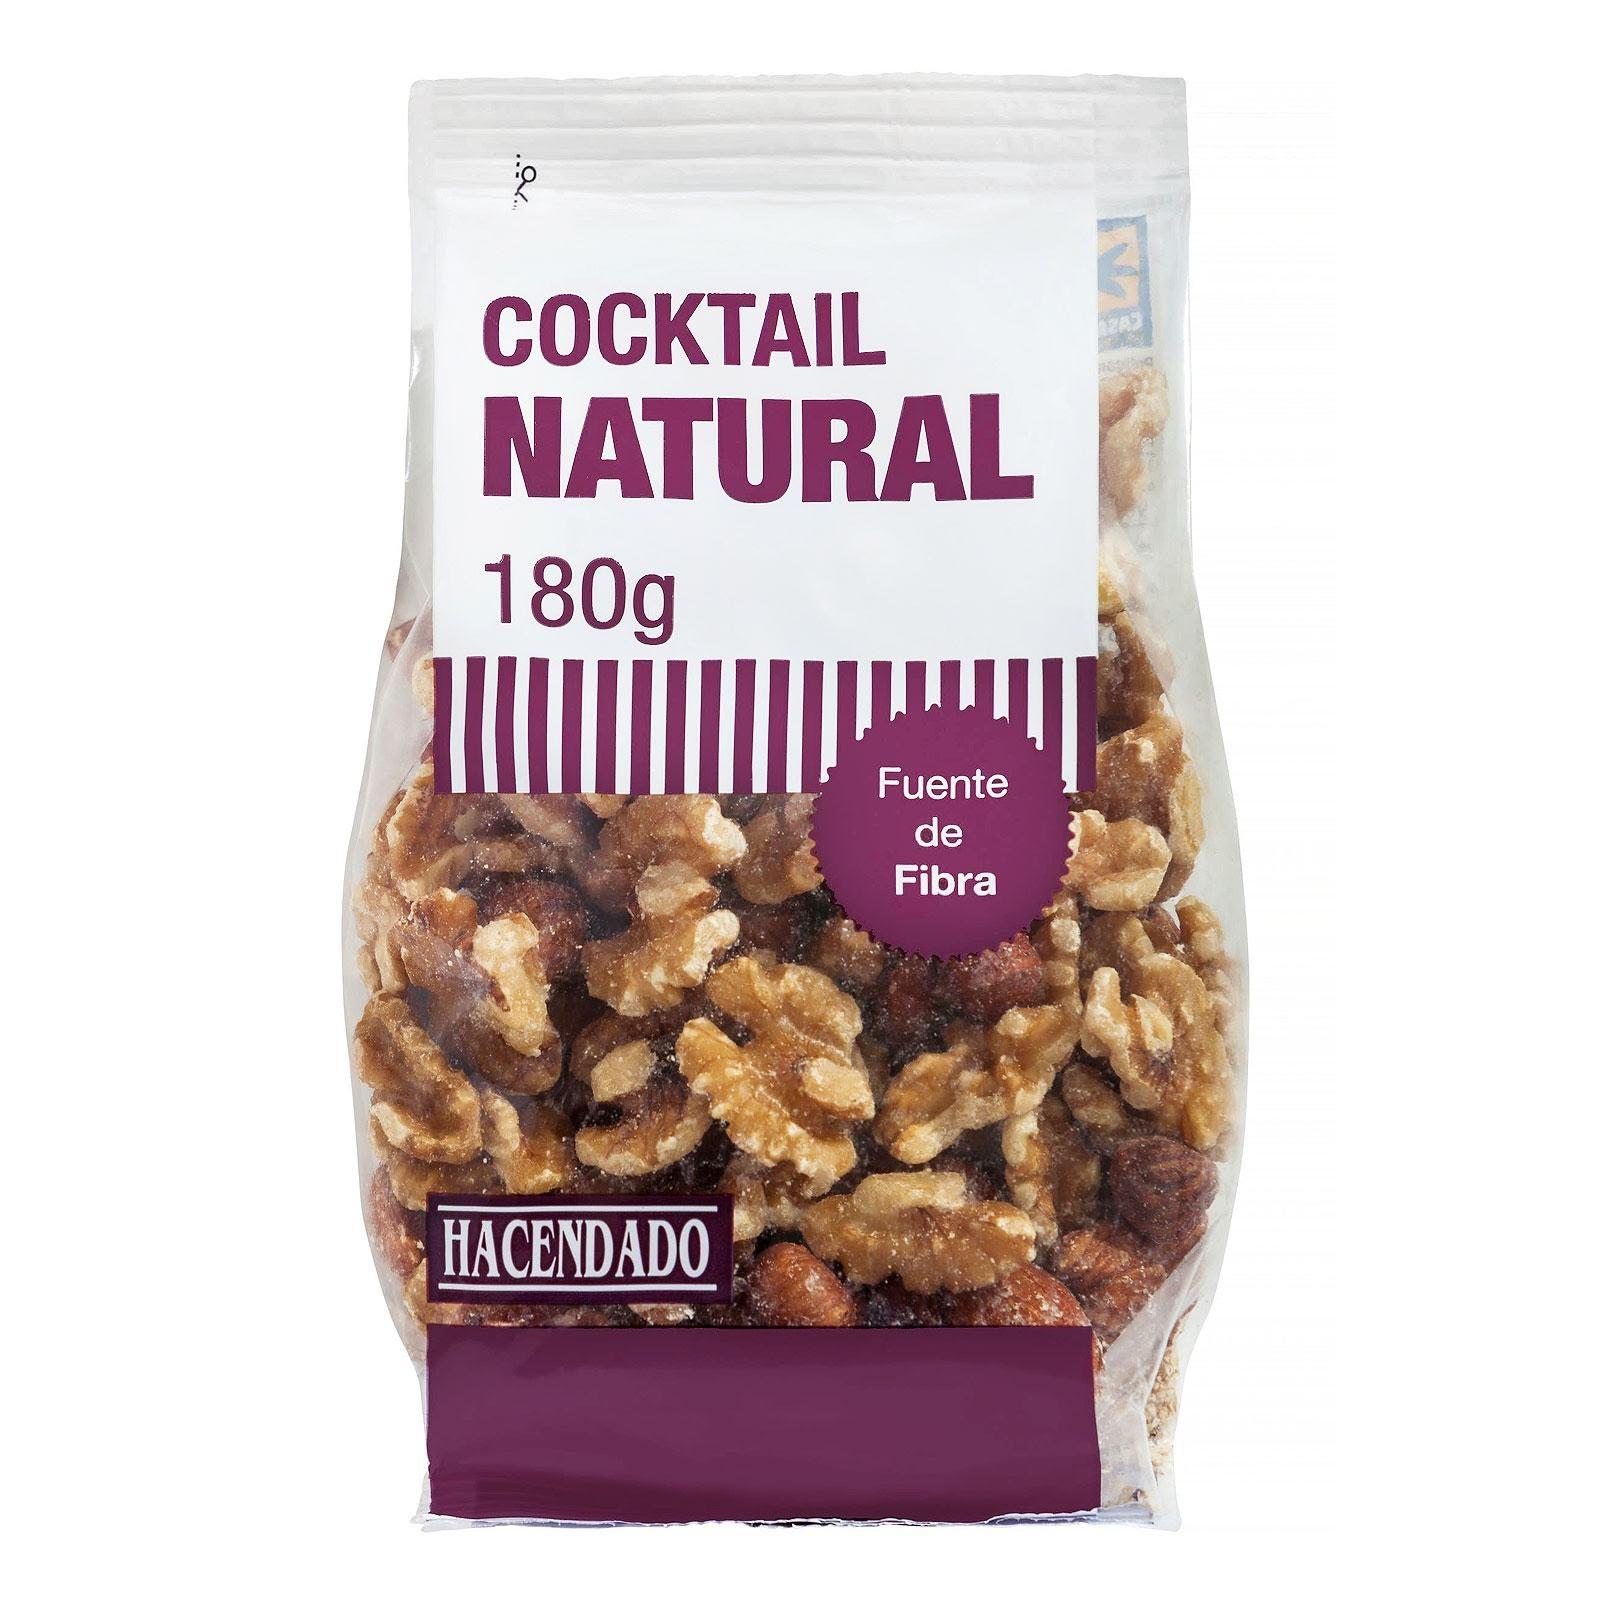 Cocktail natural Hacendado